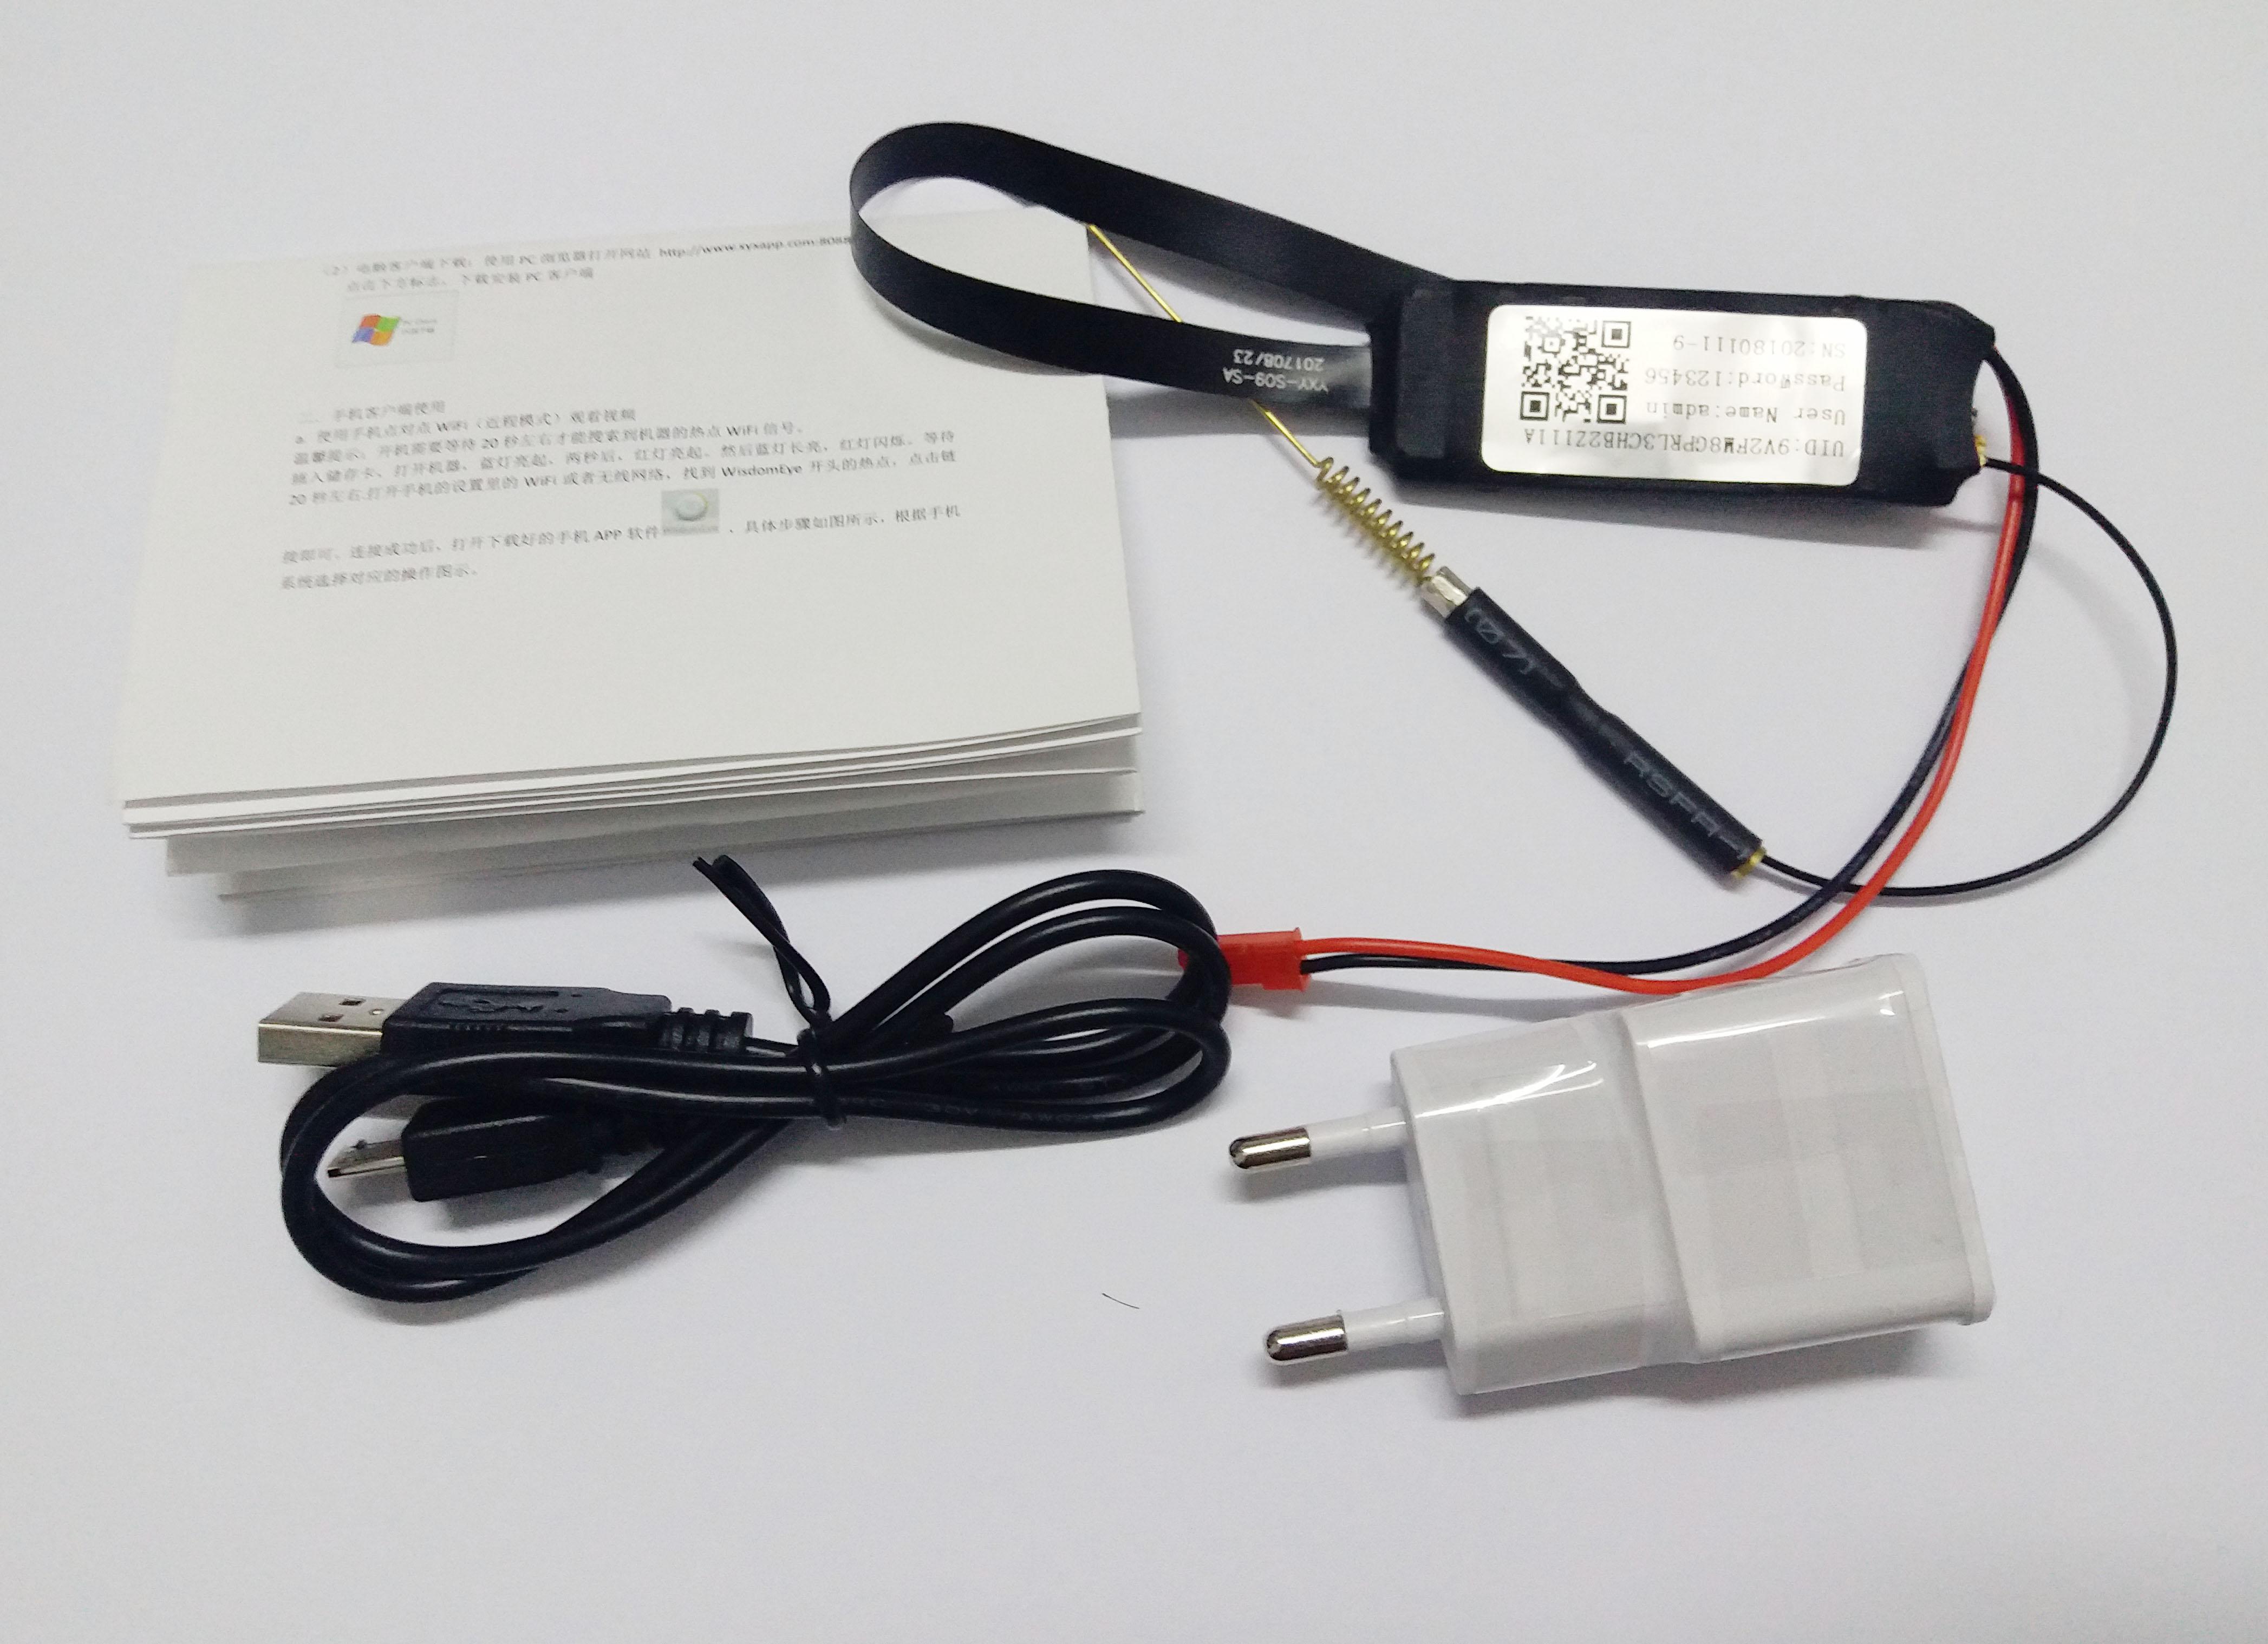 s06s-modulo-wifi-conjunto-completo-cctv-acessorios-90-graus-140-graus-night-vision-90-graus-sem-bateria